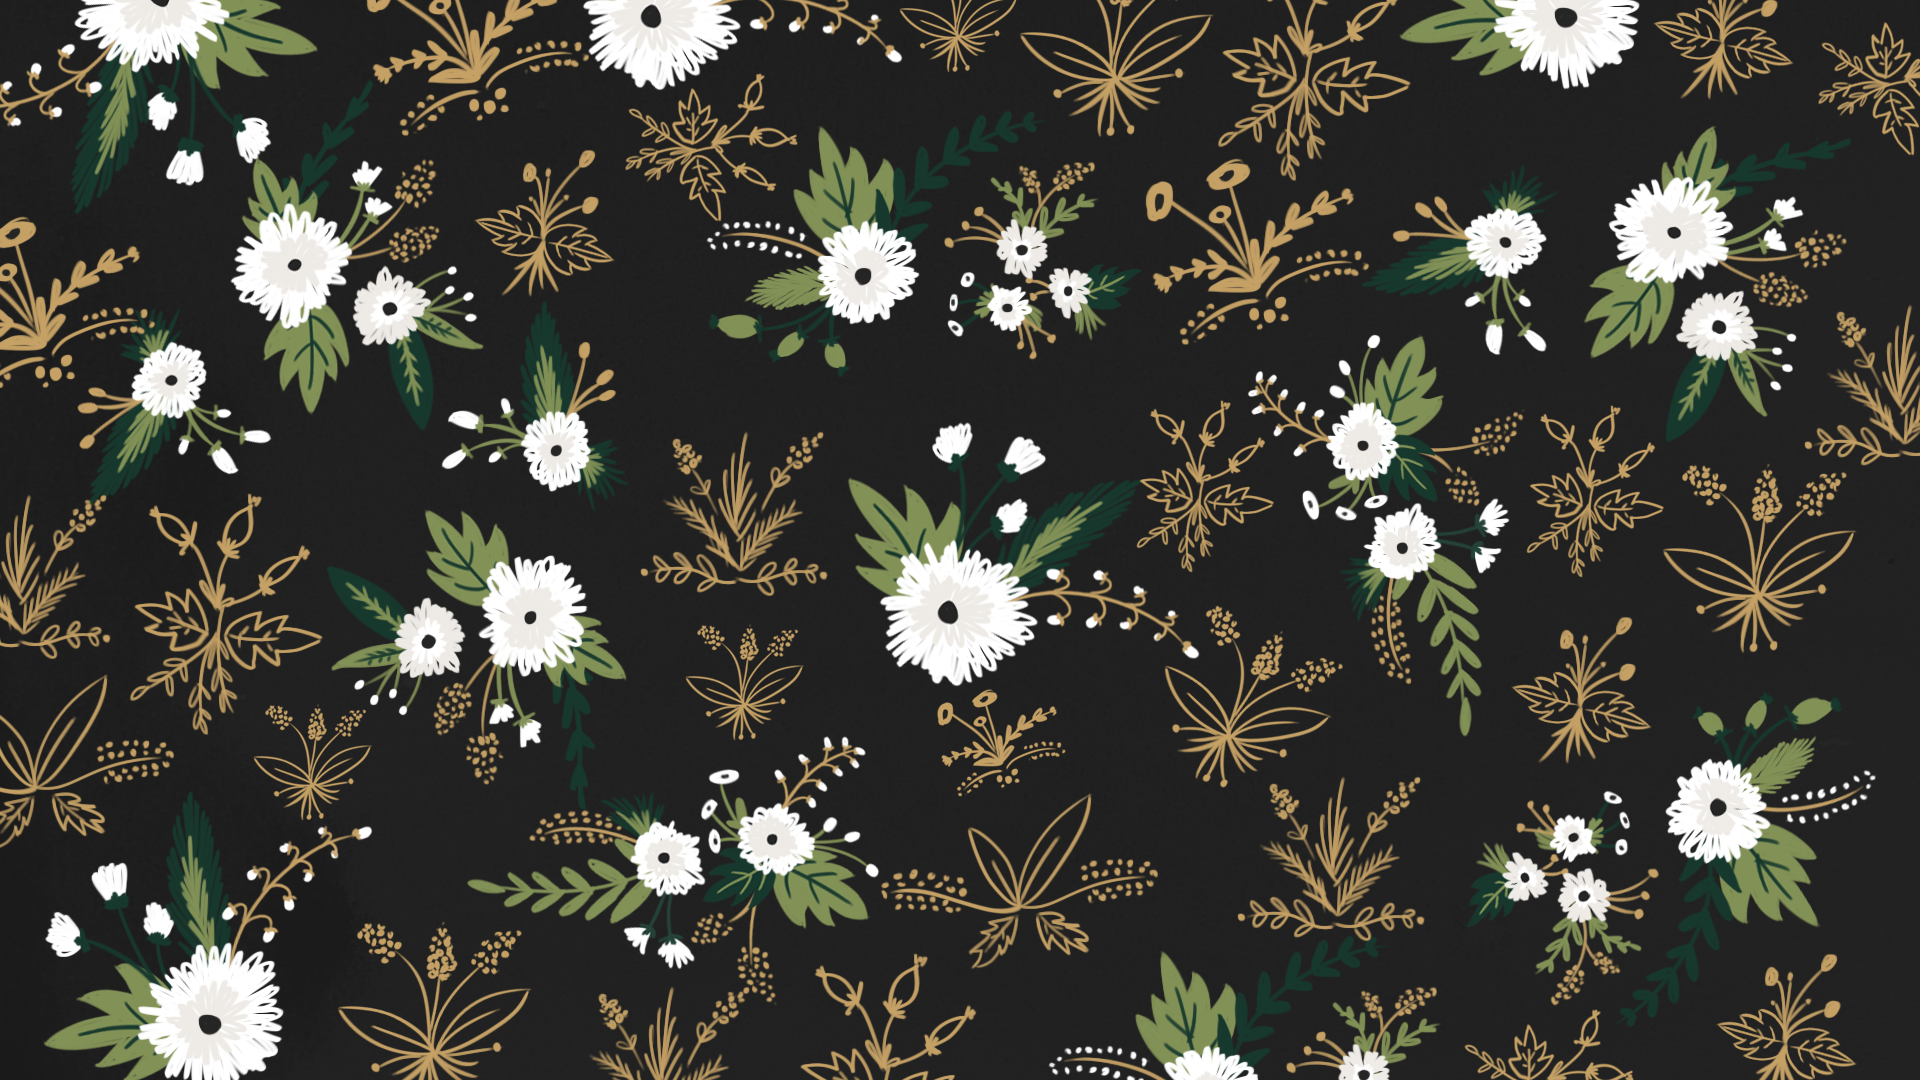 desktop_positive_pattern_by_cocoried85k113.png (1920×1080